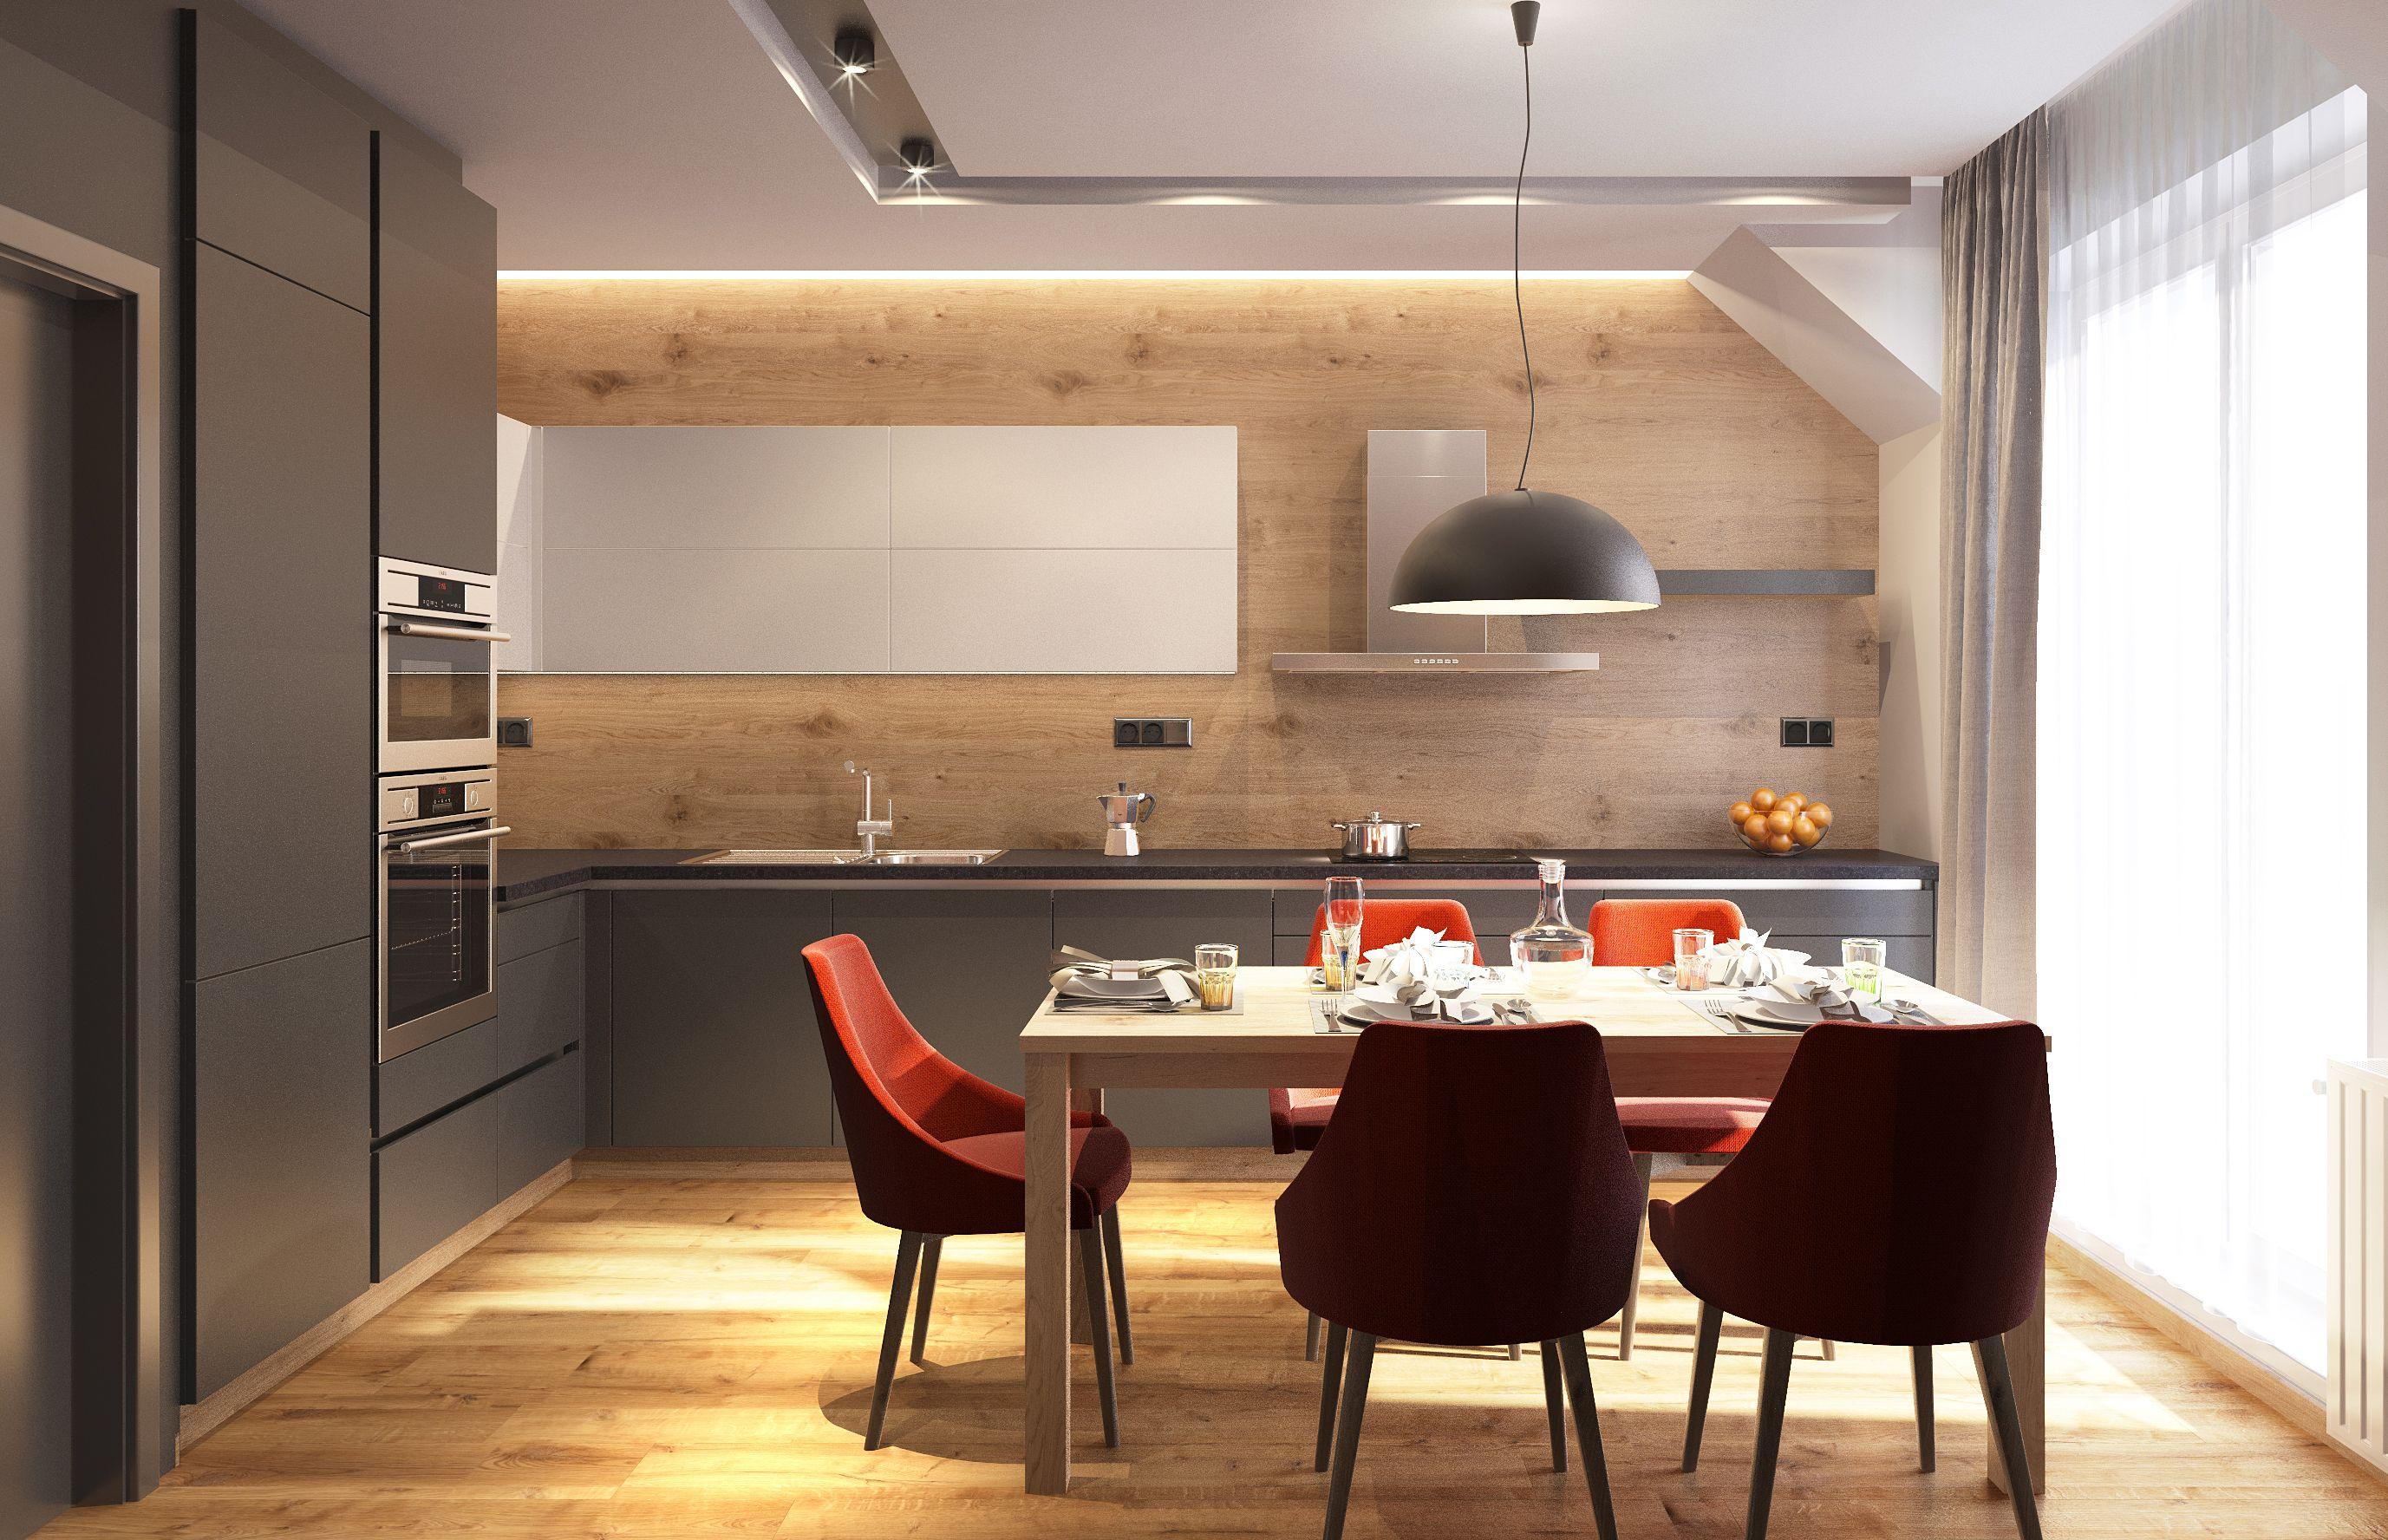 dizajn bytu interier horsky styl (5)